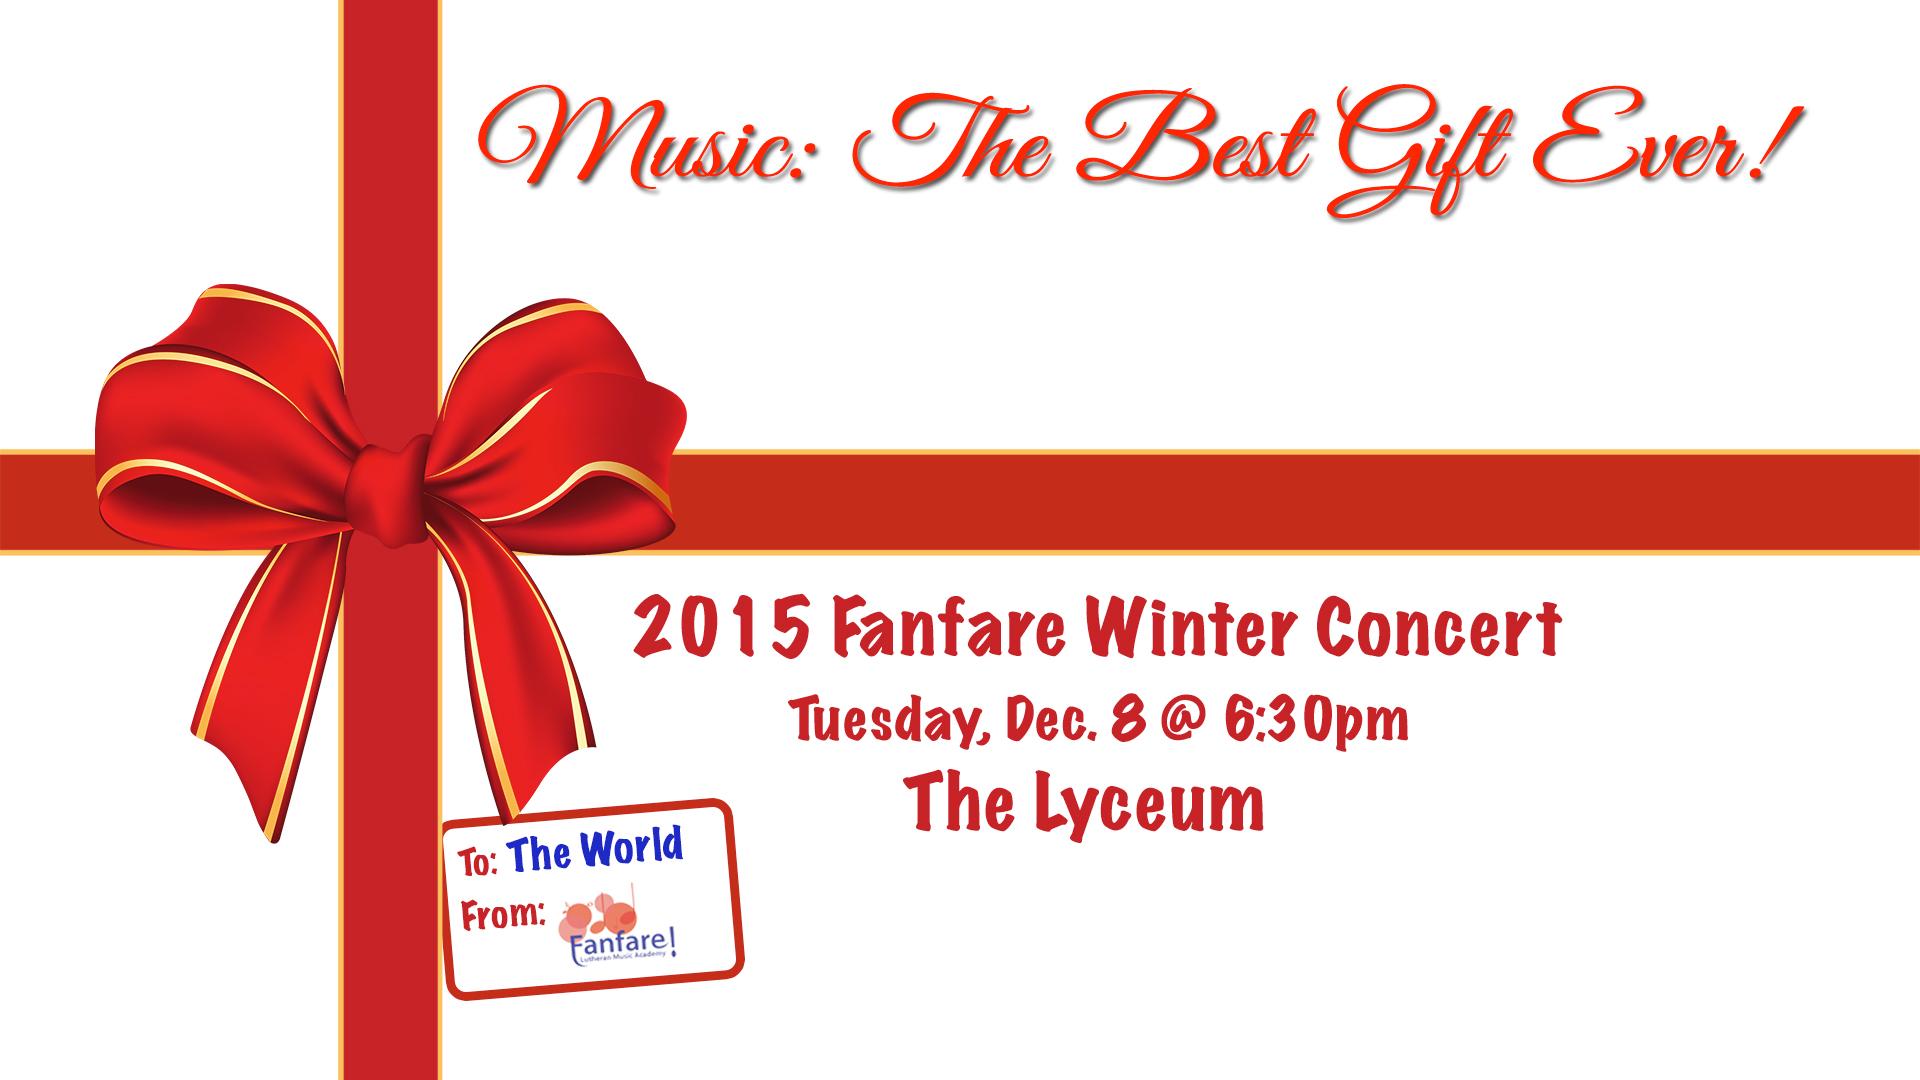 Fanfare Winter Concert